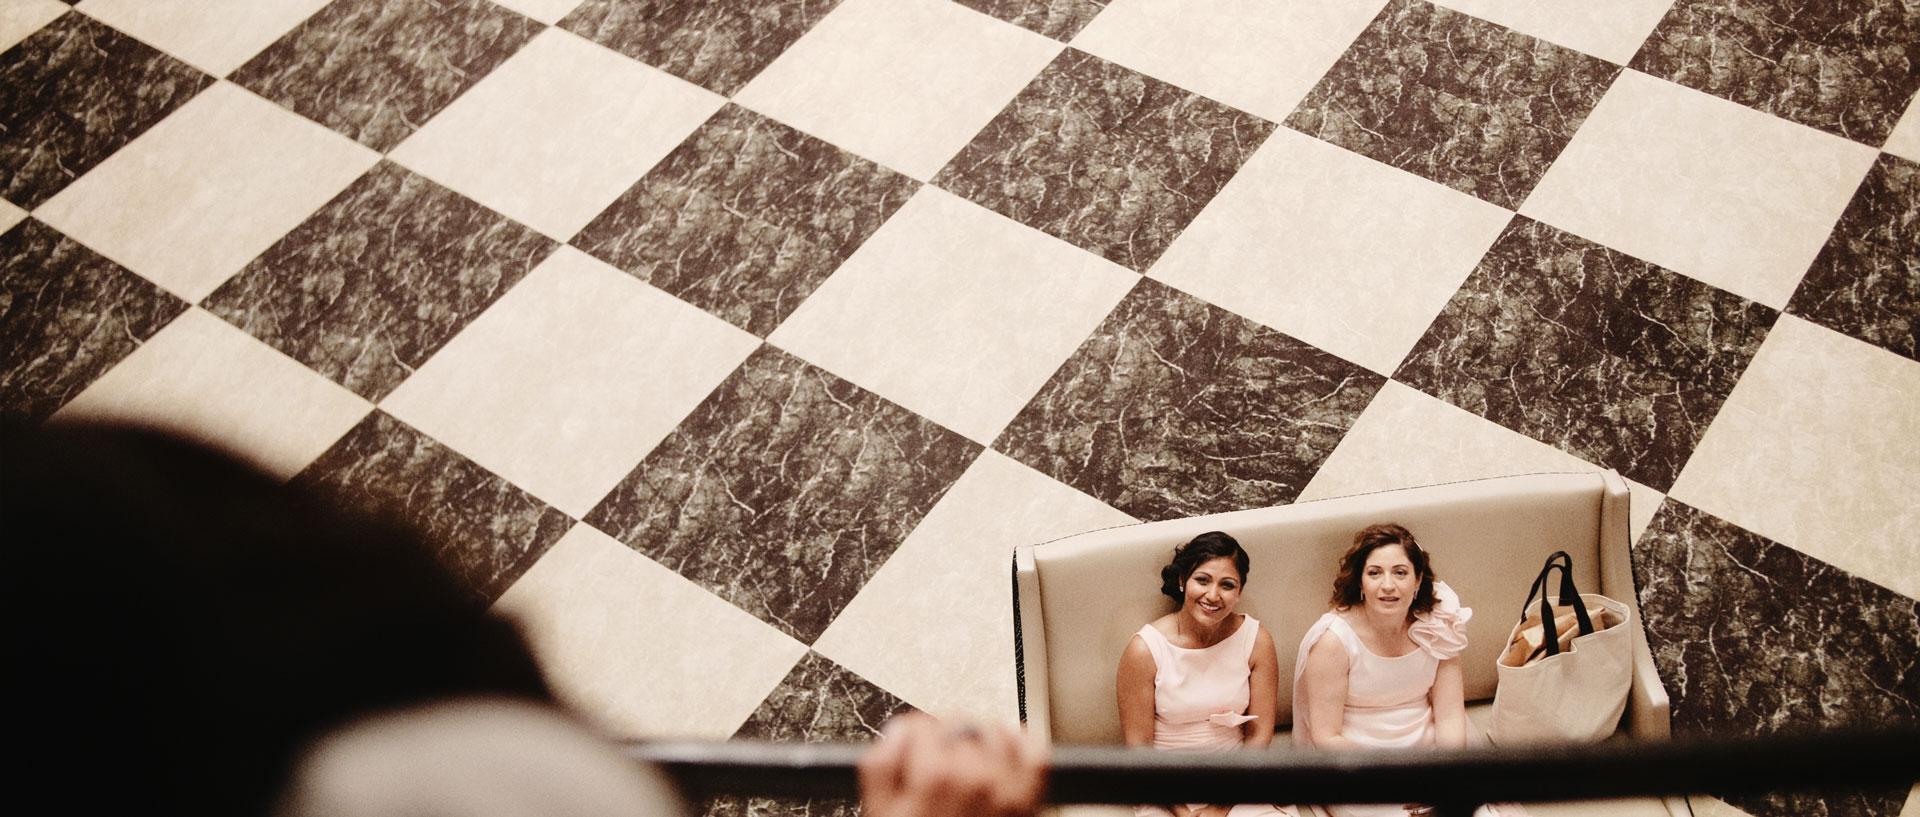 Natasha & Jad Wedding - Casino Biarritz (24).jpg